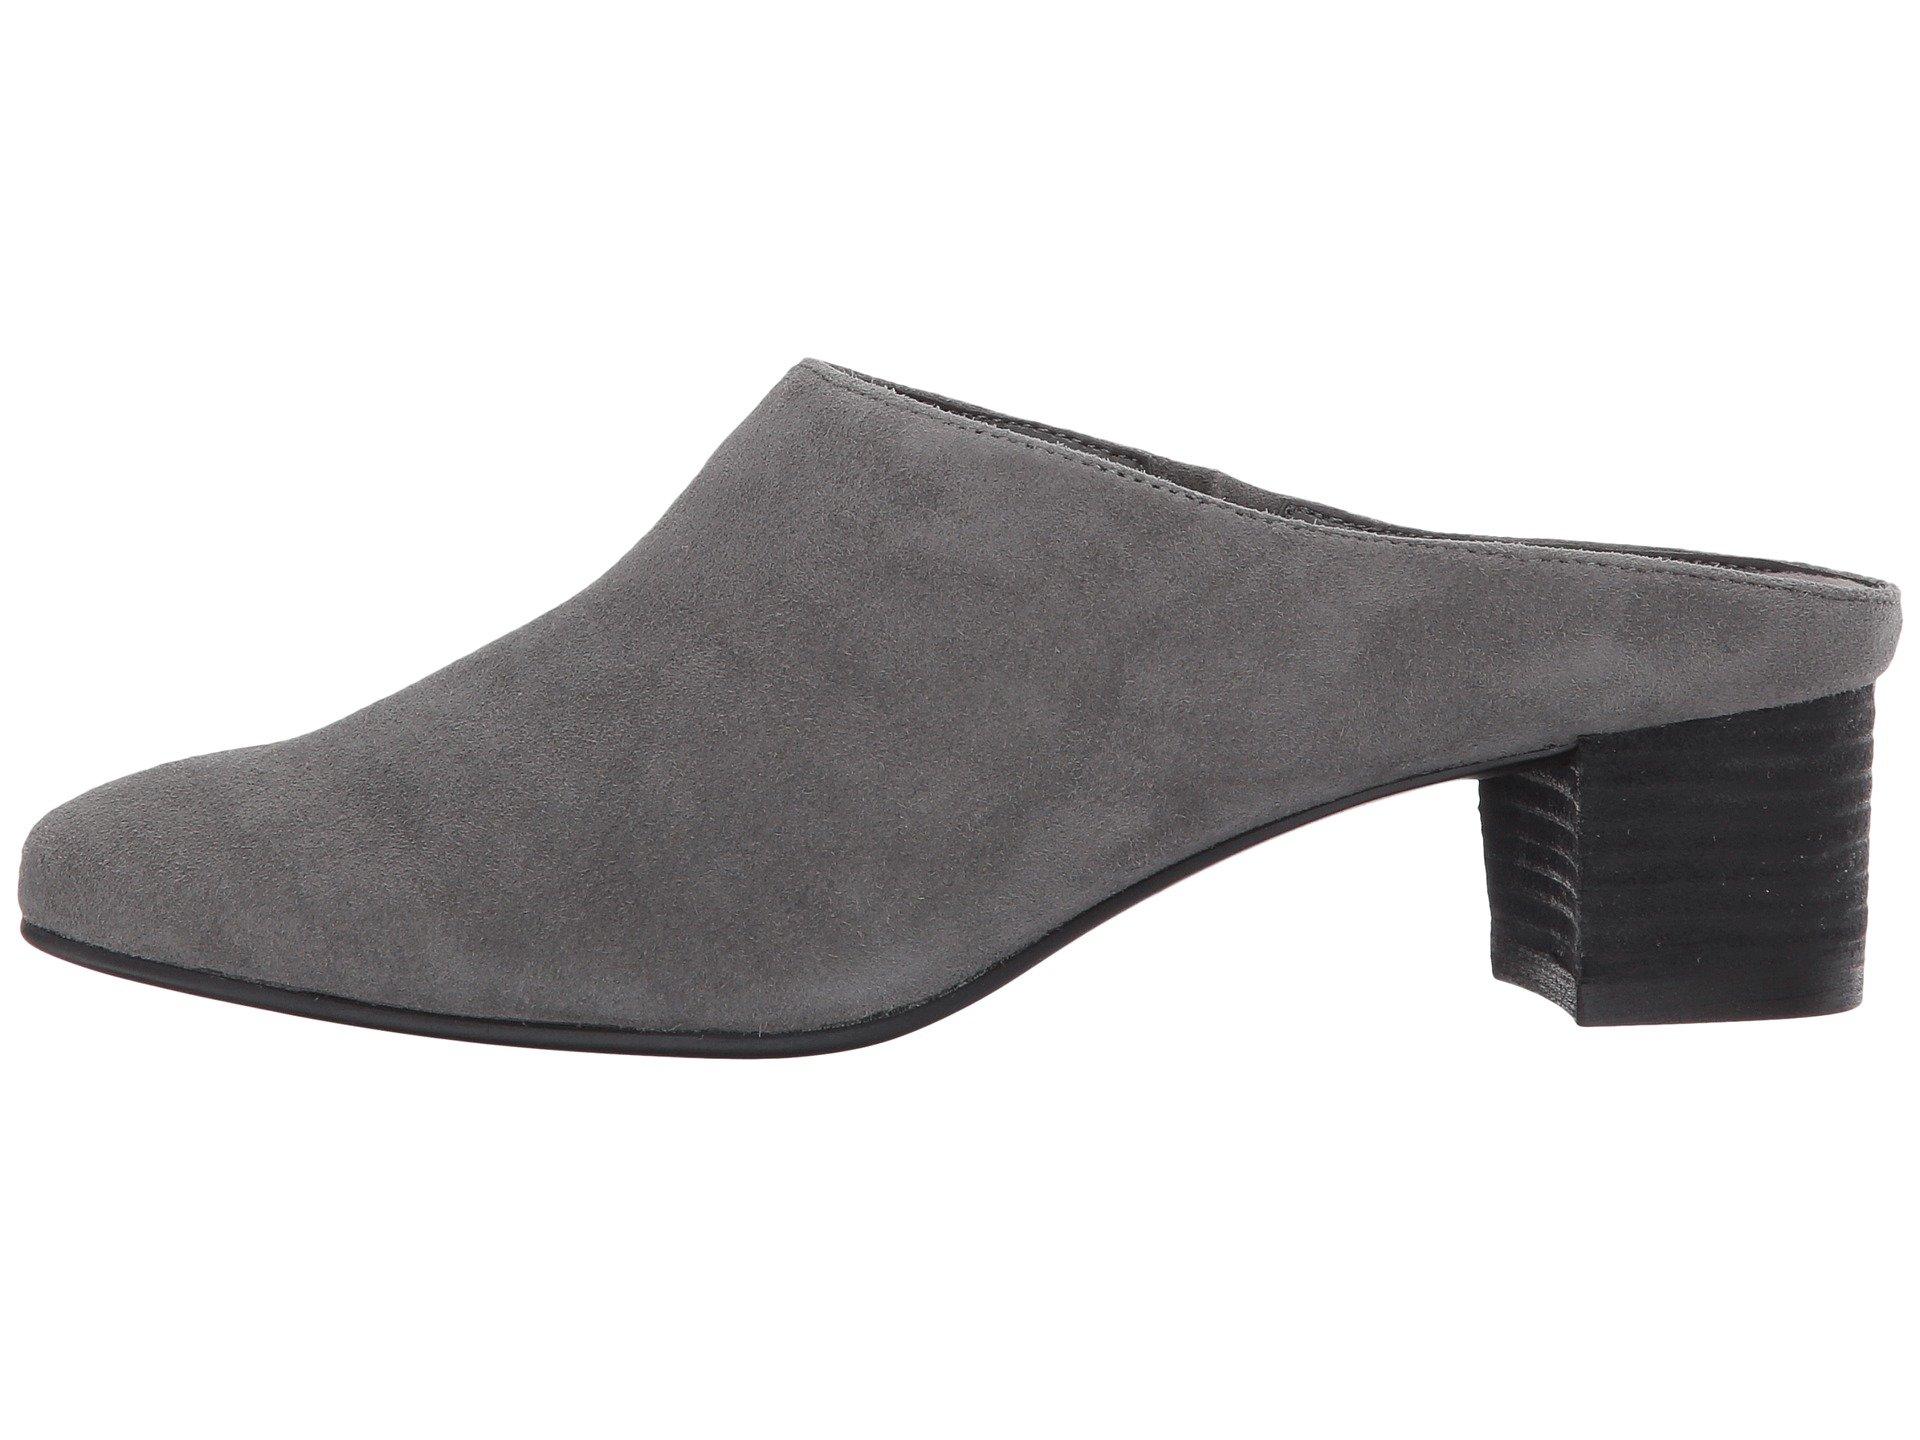 1920x1440 Aerosoles Women's Shoes Crash Pad Dark Gray Suede Leather Or Suede